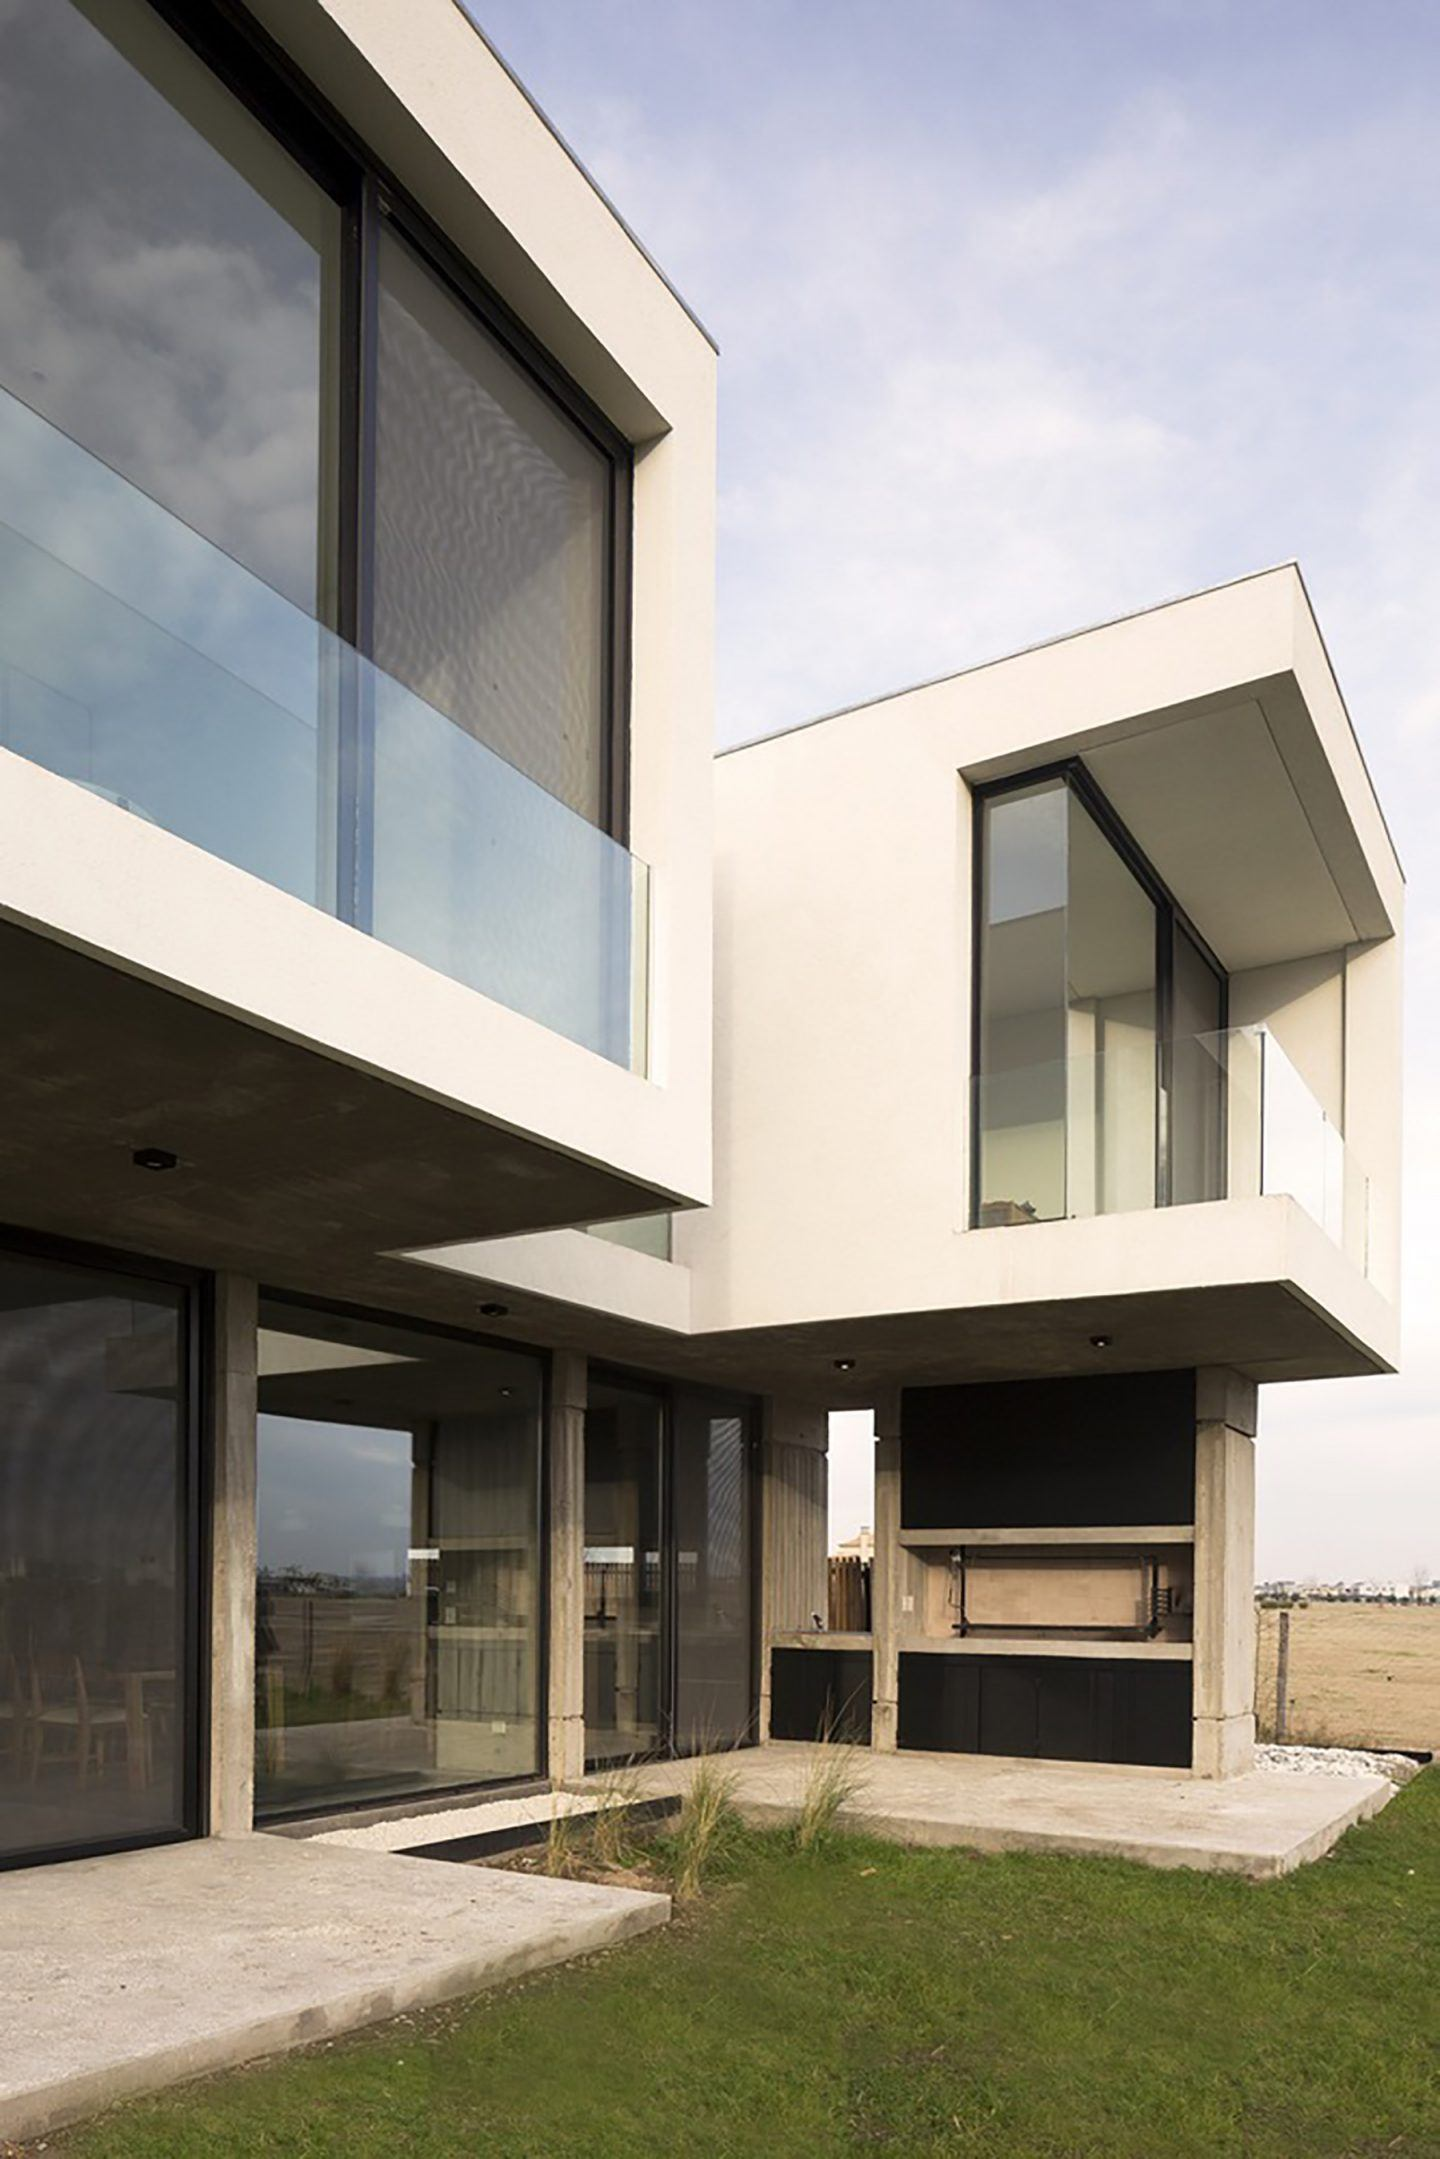 IGNANT-Architecture-BAM!-Arquitectura-Golf-House-12